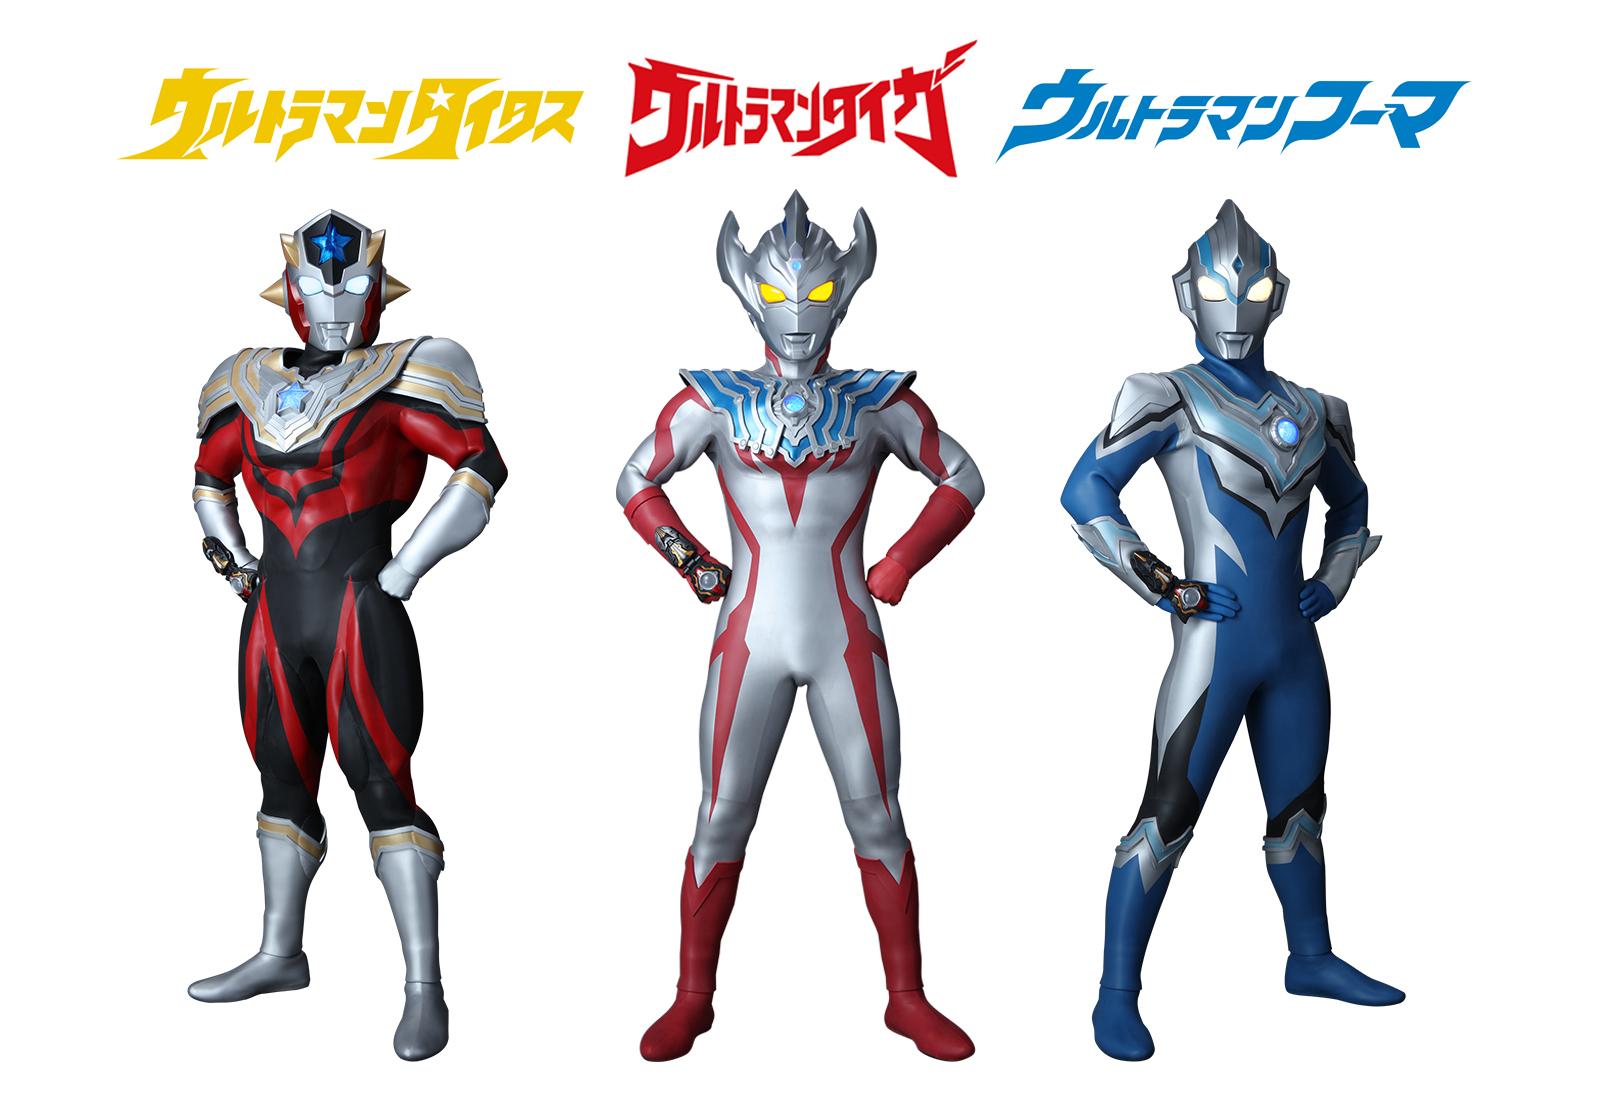 Introducing the son of Taro, Ultraman Taiga!